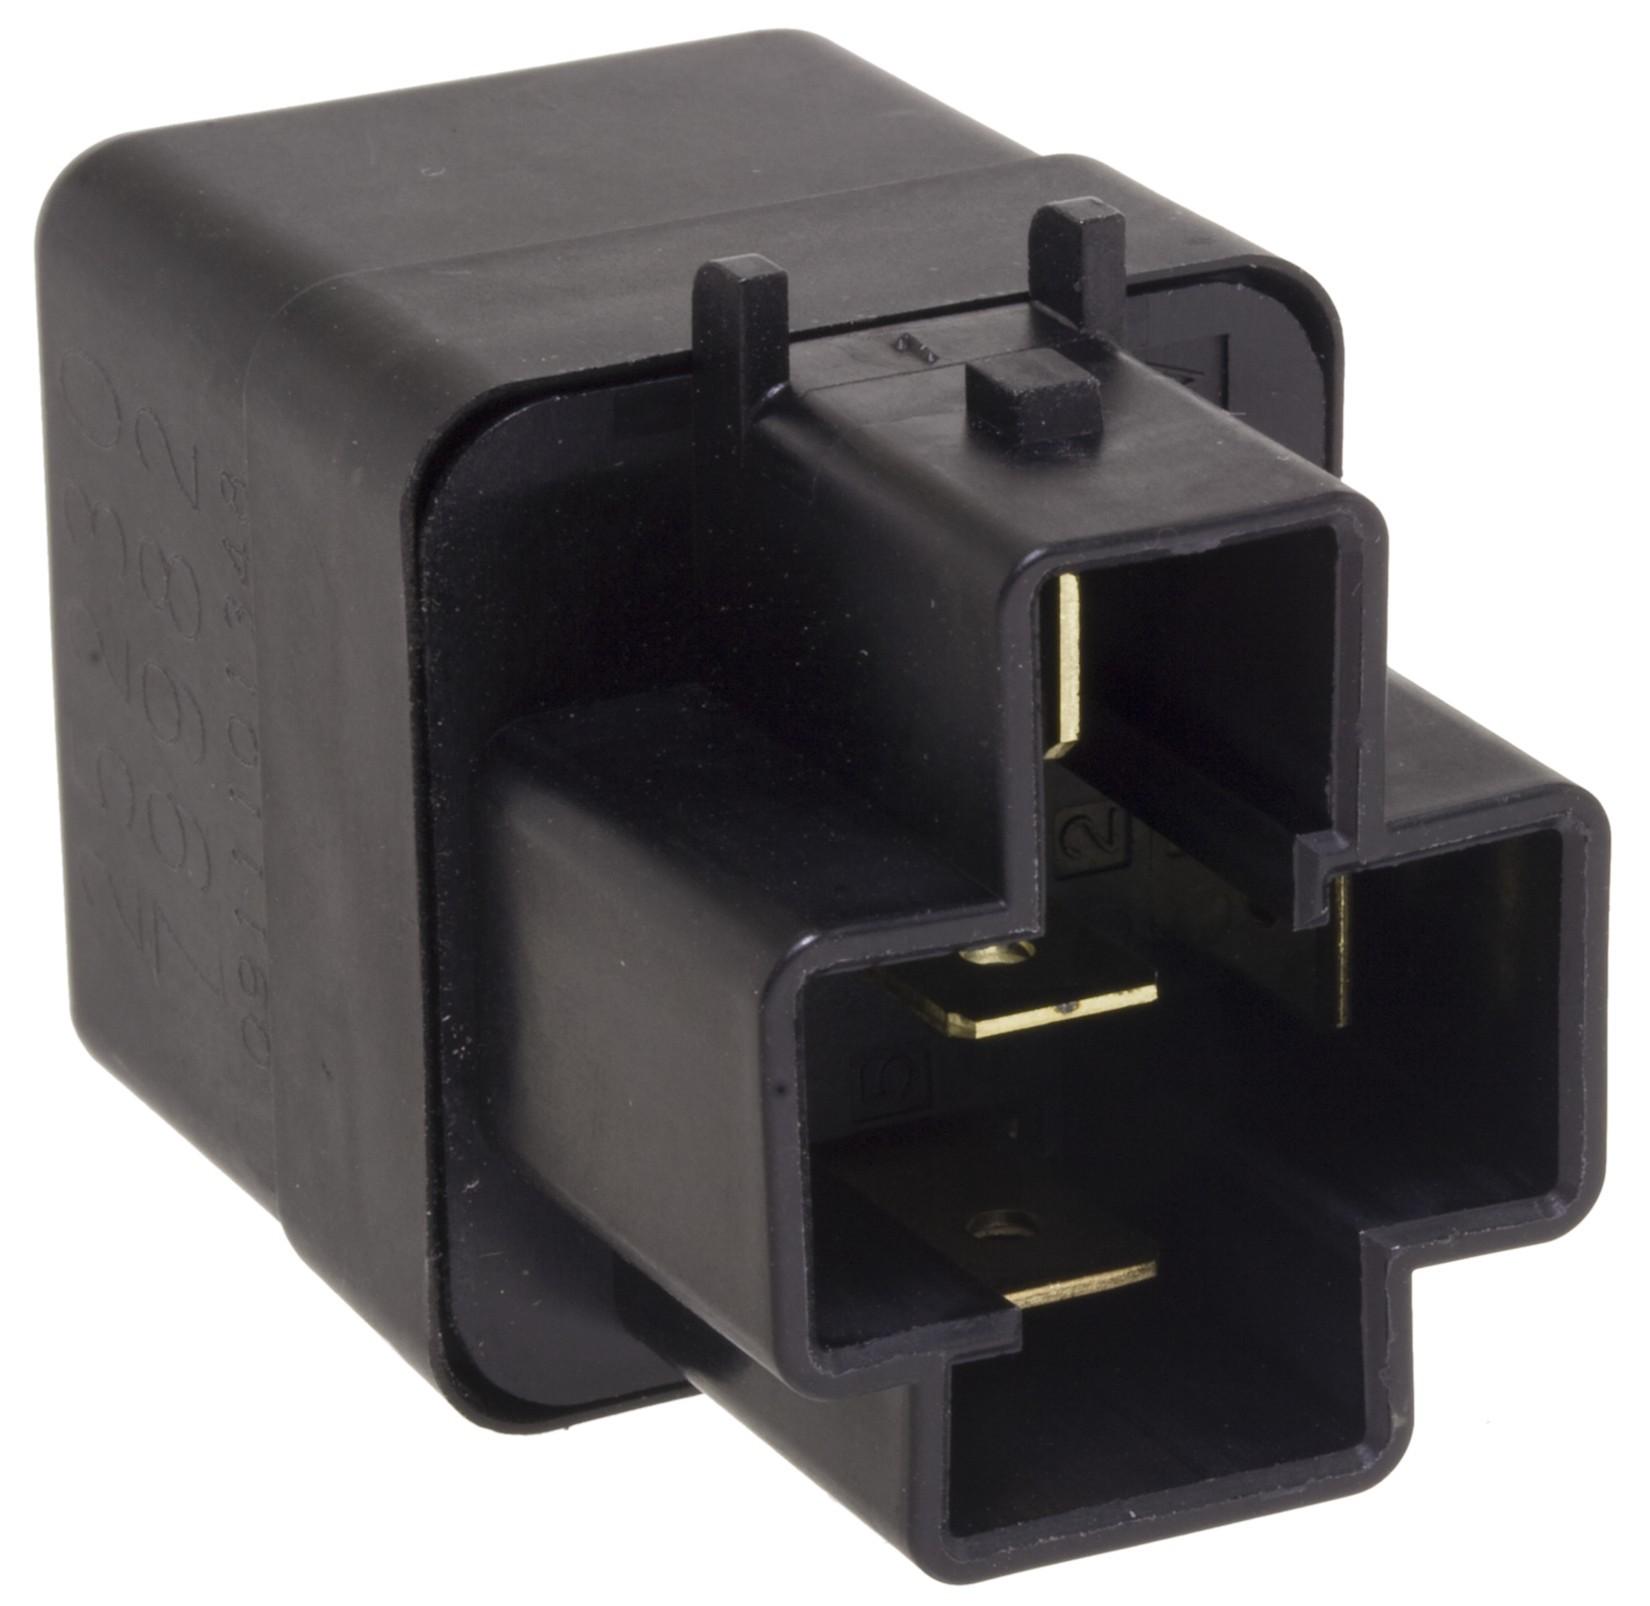 Windshield wiper motor relay airtex 1r1561 ebay for Windshield wiper motor relay